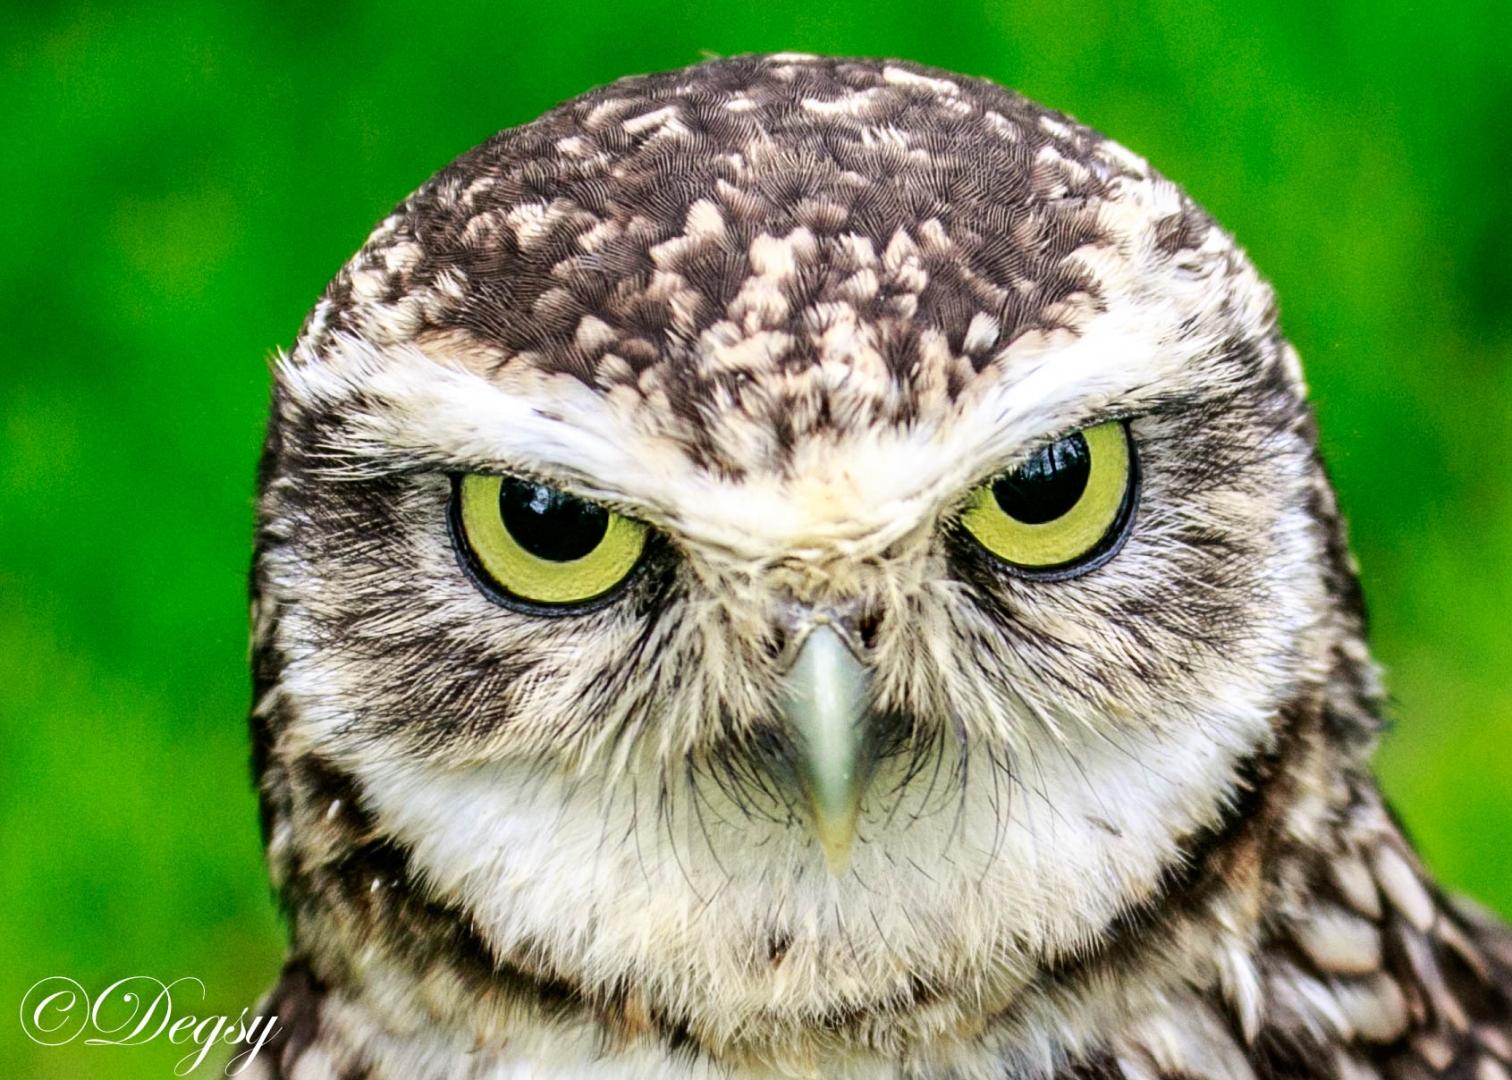 owl eyes fur green beak wildlife